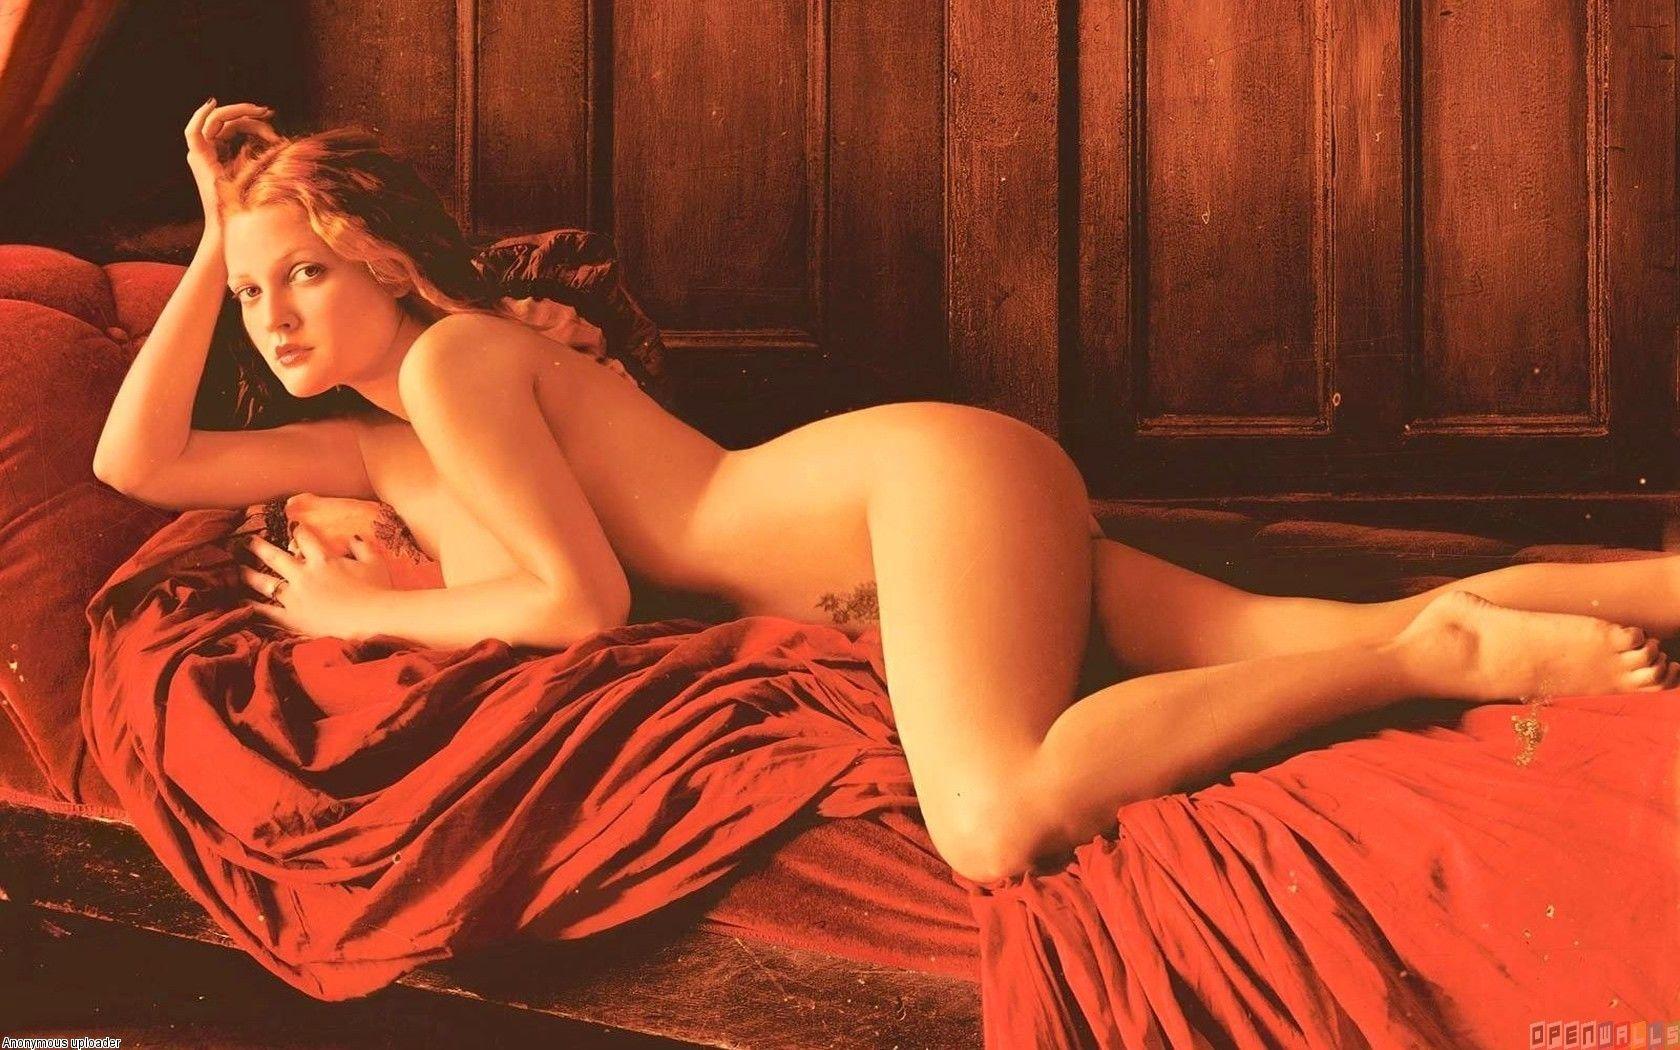 Watch Drew barrymore nude photos video